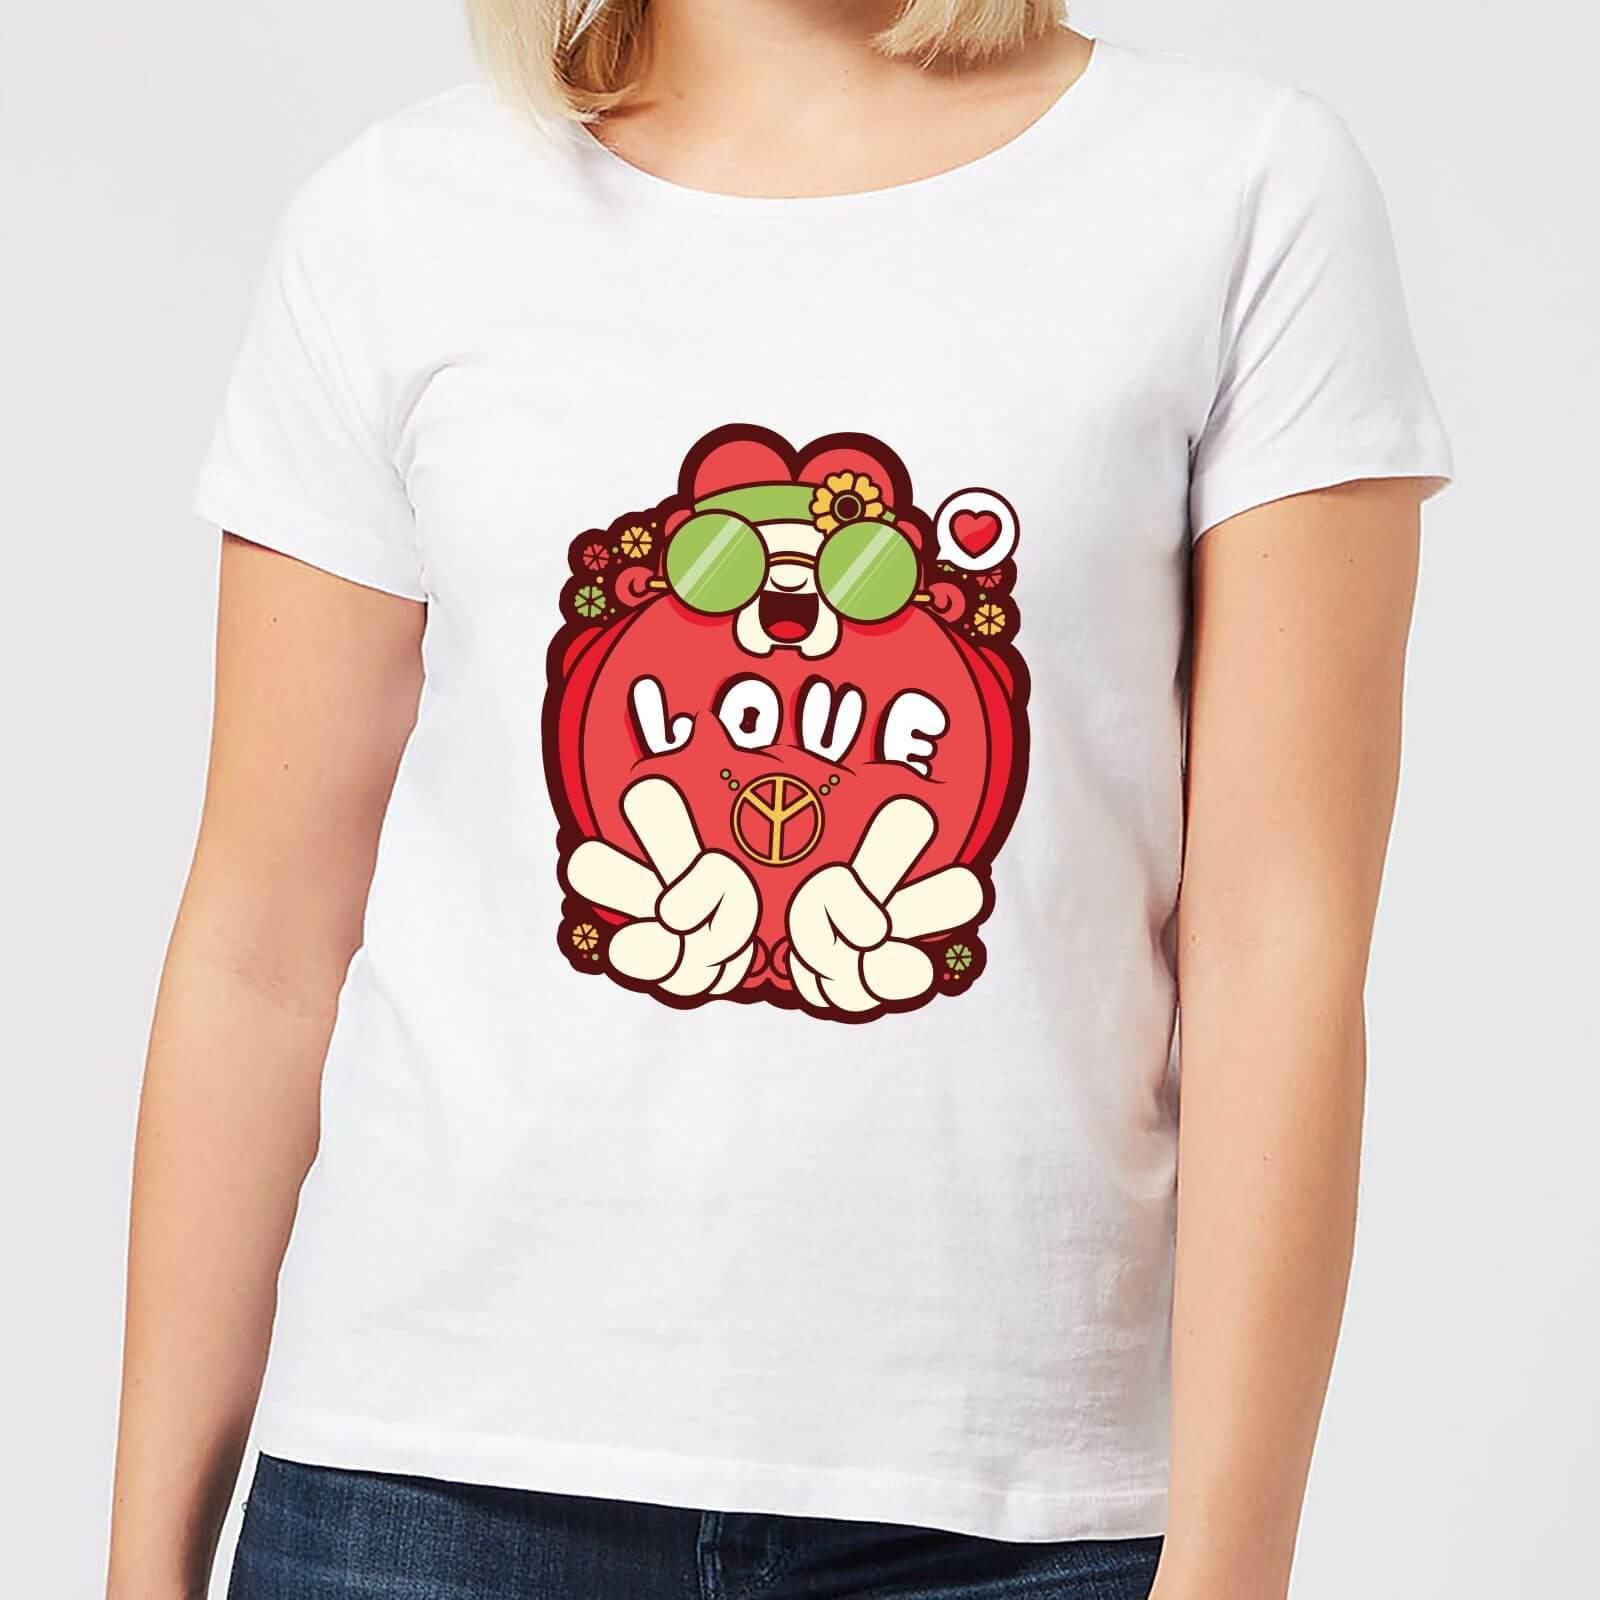 IWOOT Hippie Love Cartoon Women's T-Shirt - White - L - White